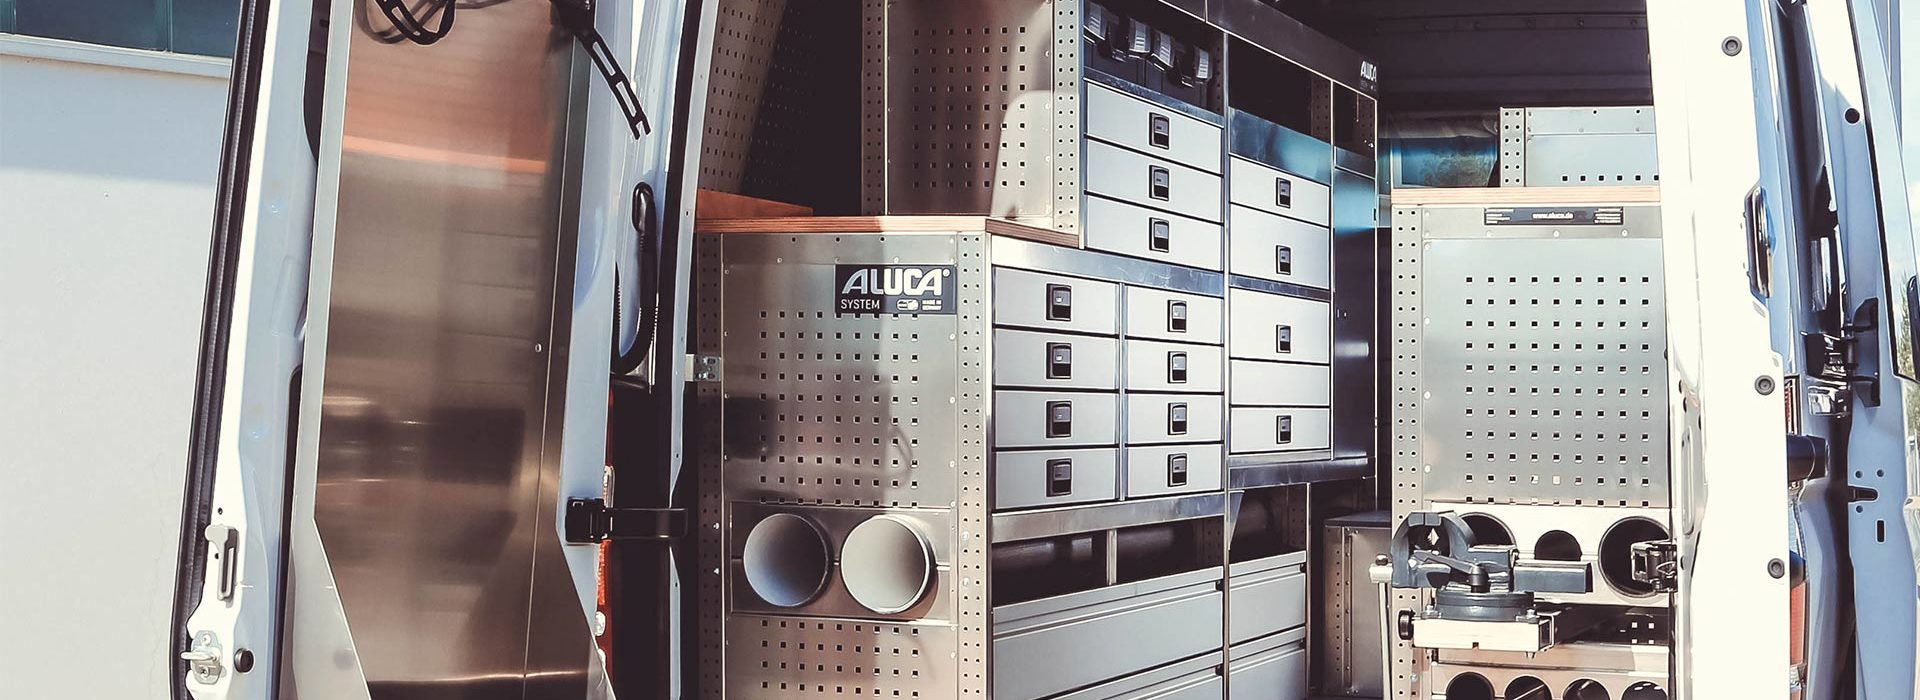 01.02_04_ALUCA_Produktwelt_System-ALUCA_Sprinter